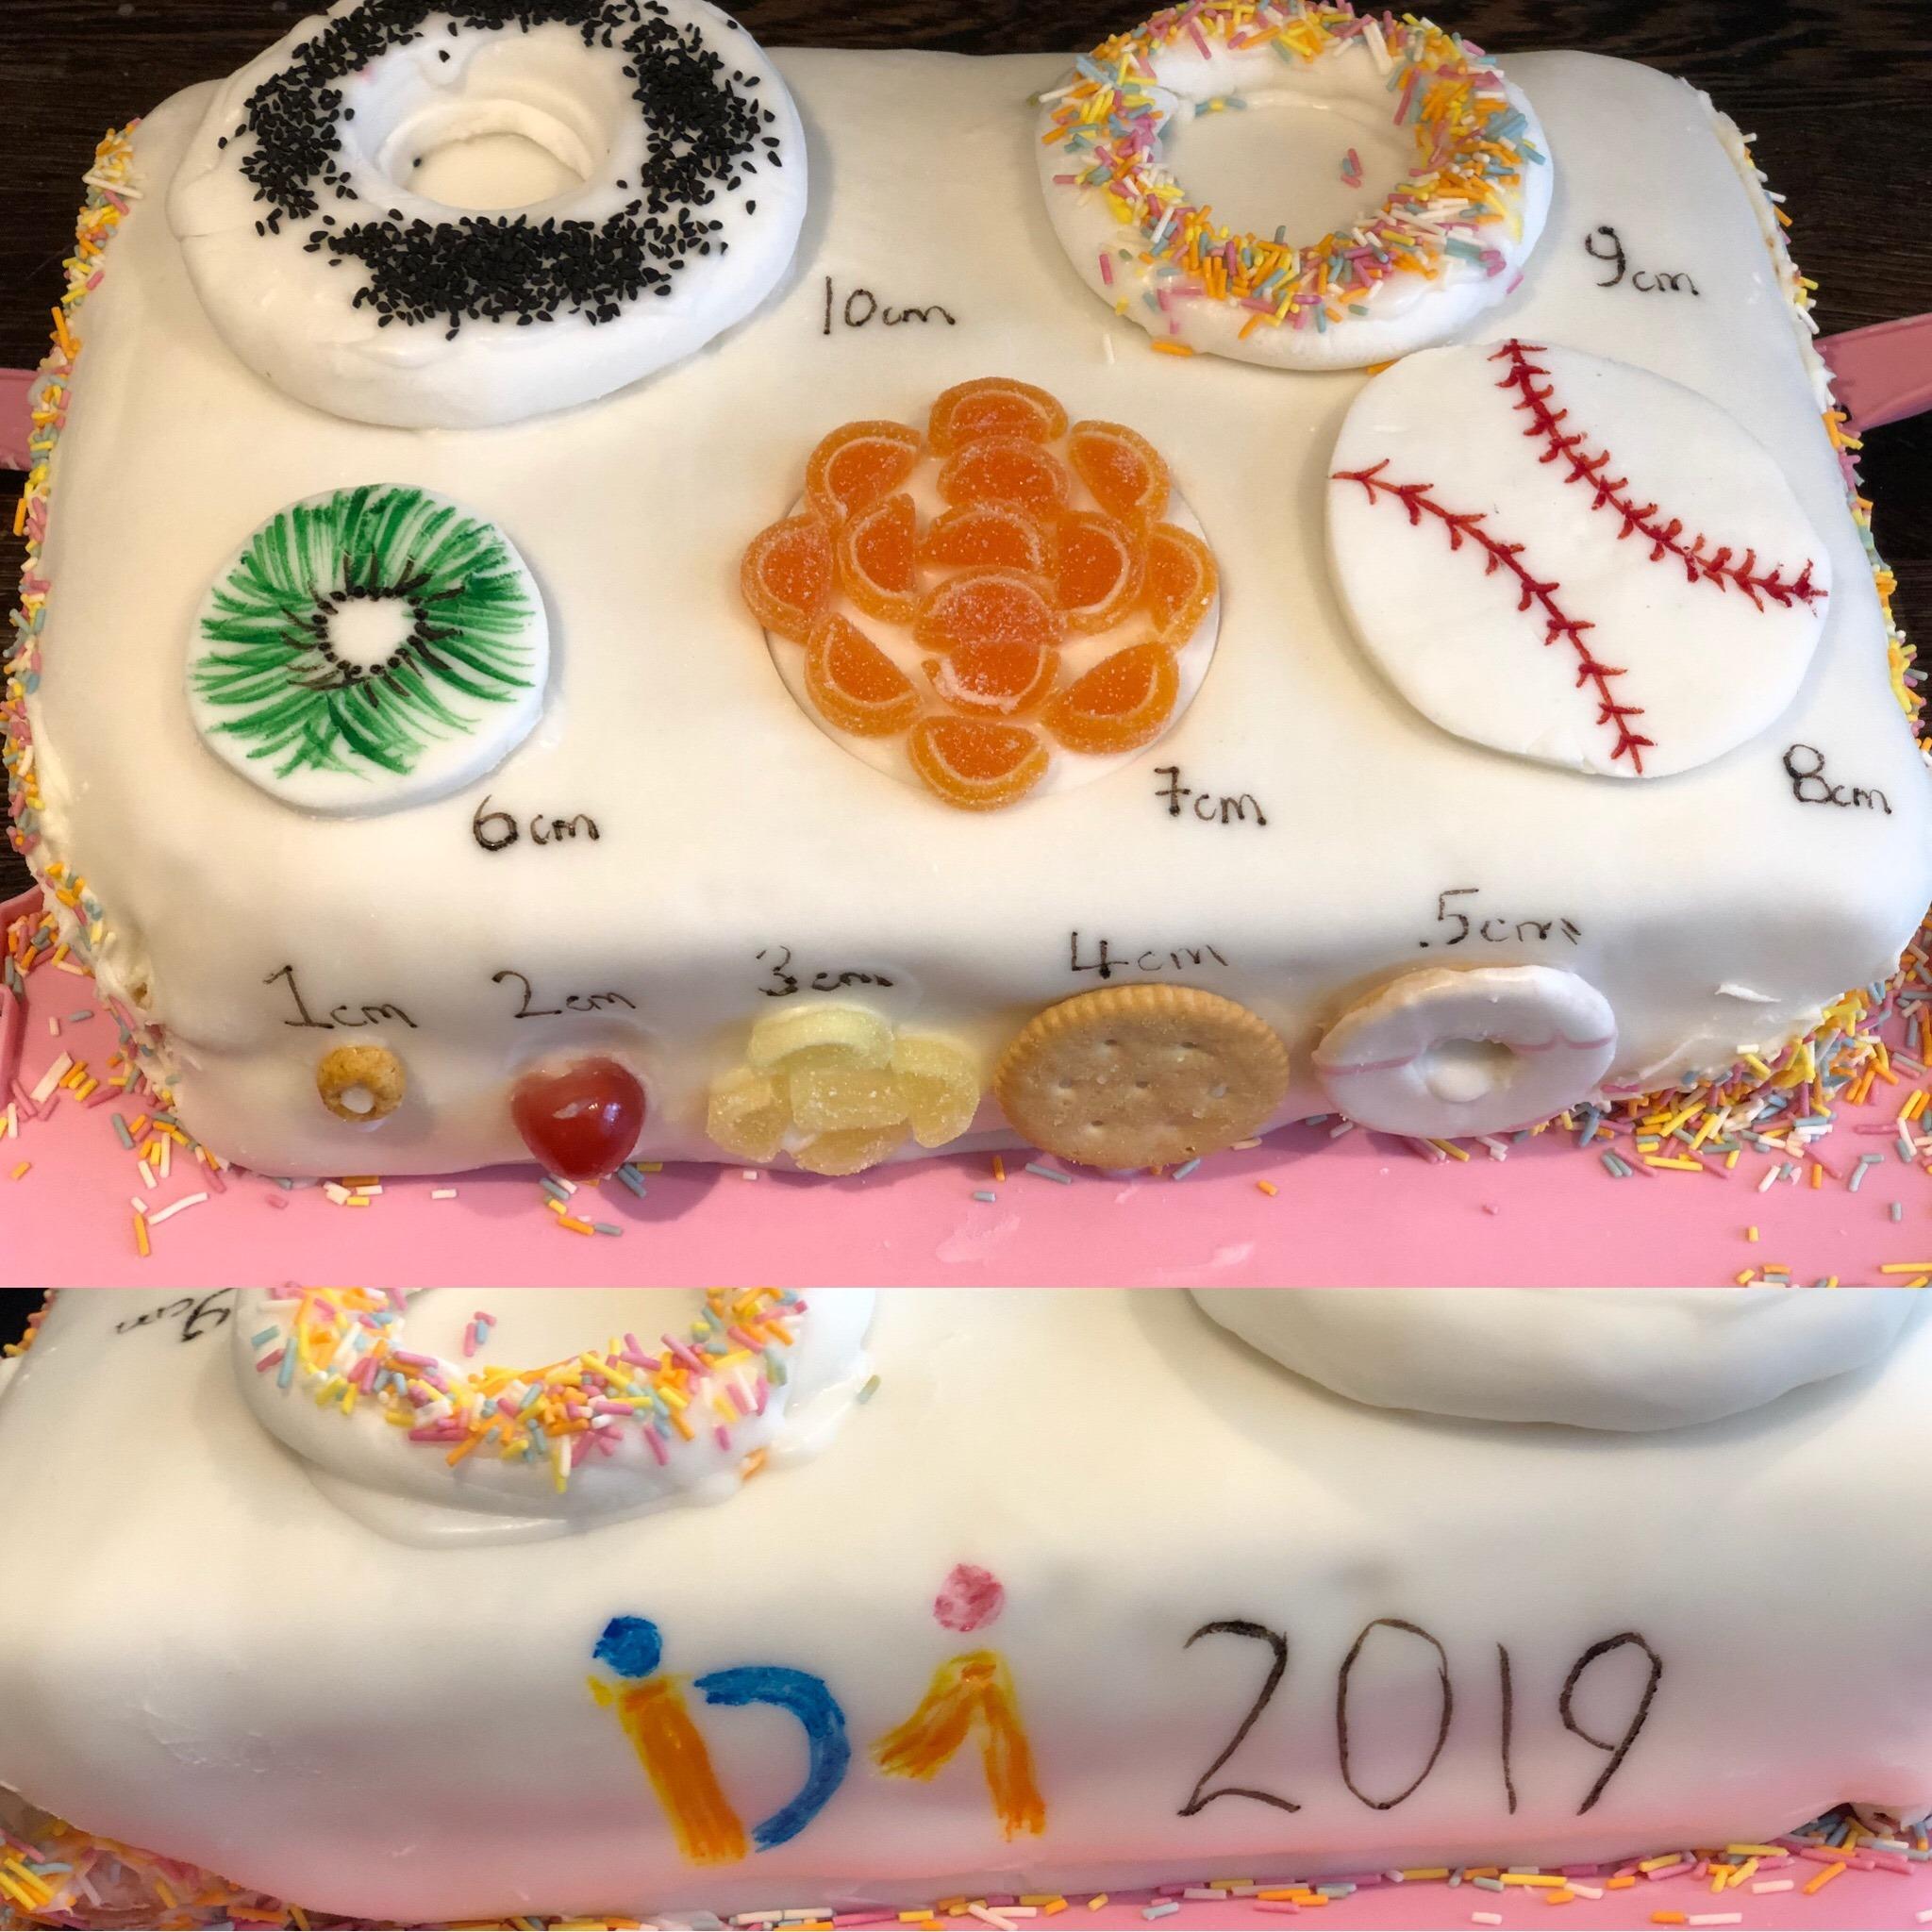 RCM dilation cake